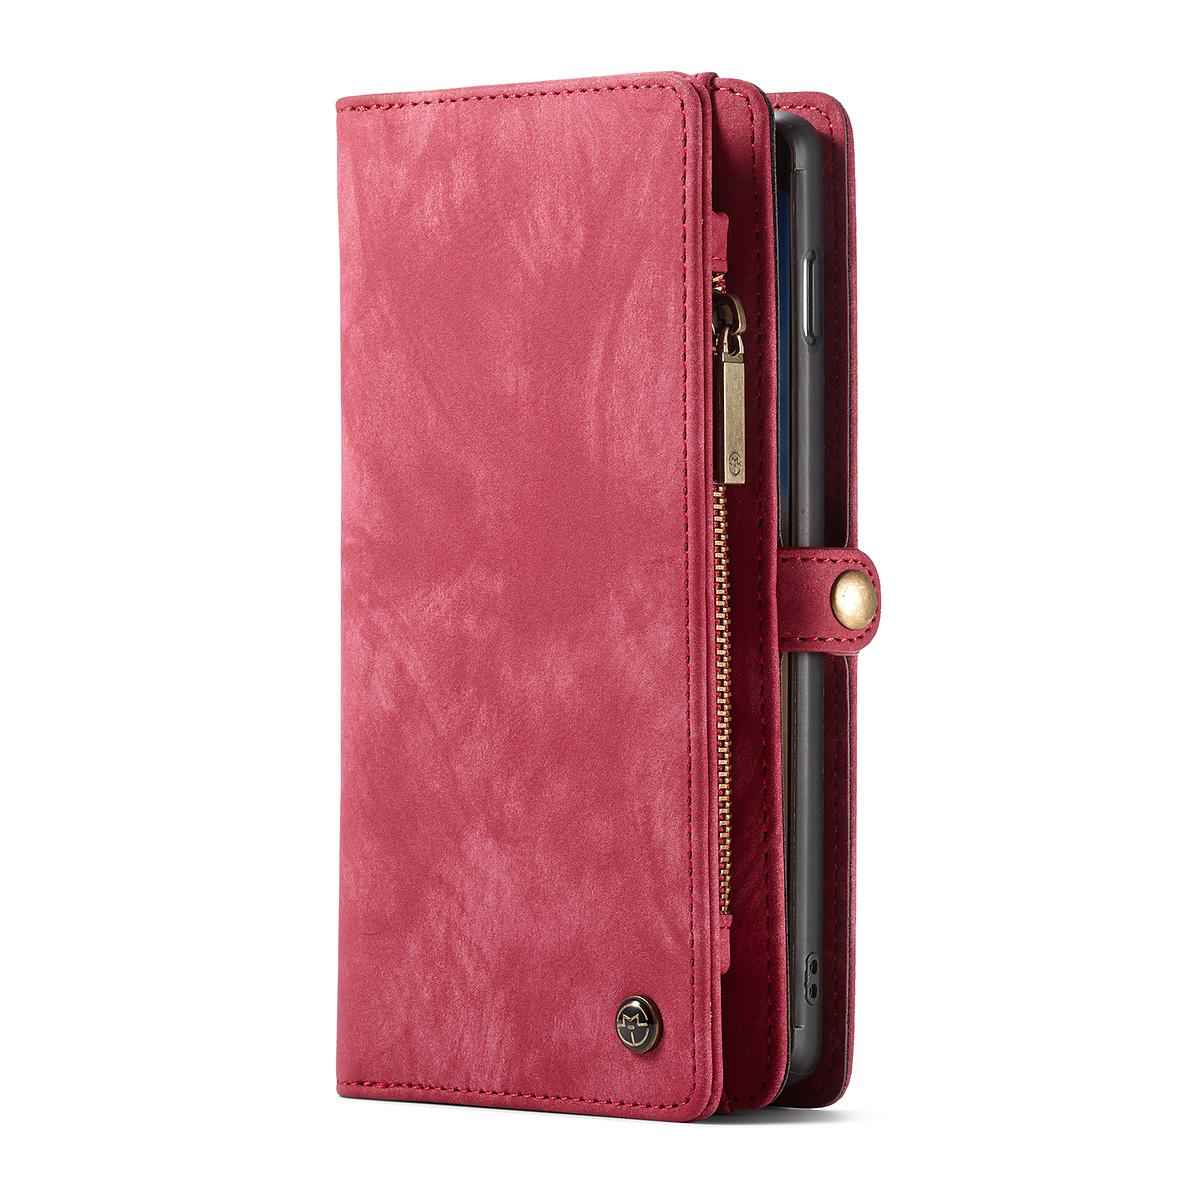 CaseMe plånboksfodral med magnetskal, Samsung Galaxy S10, röd